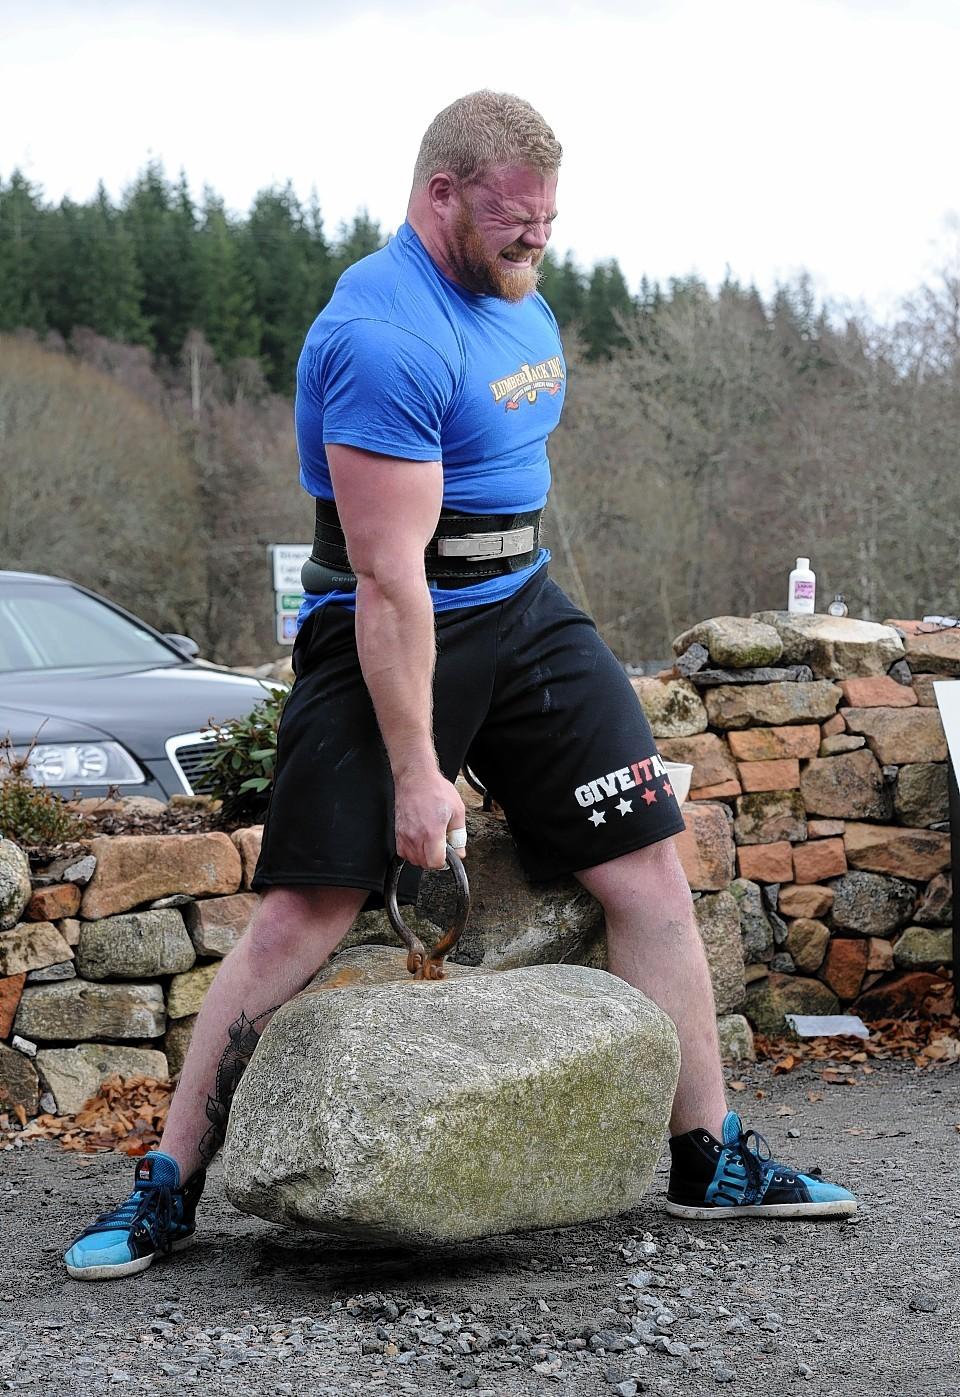 Aberdeen's Ben Thomson takes on the stones. Credit: Colin Rennie.